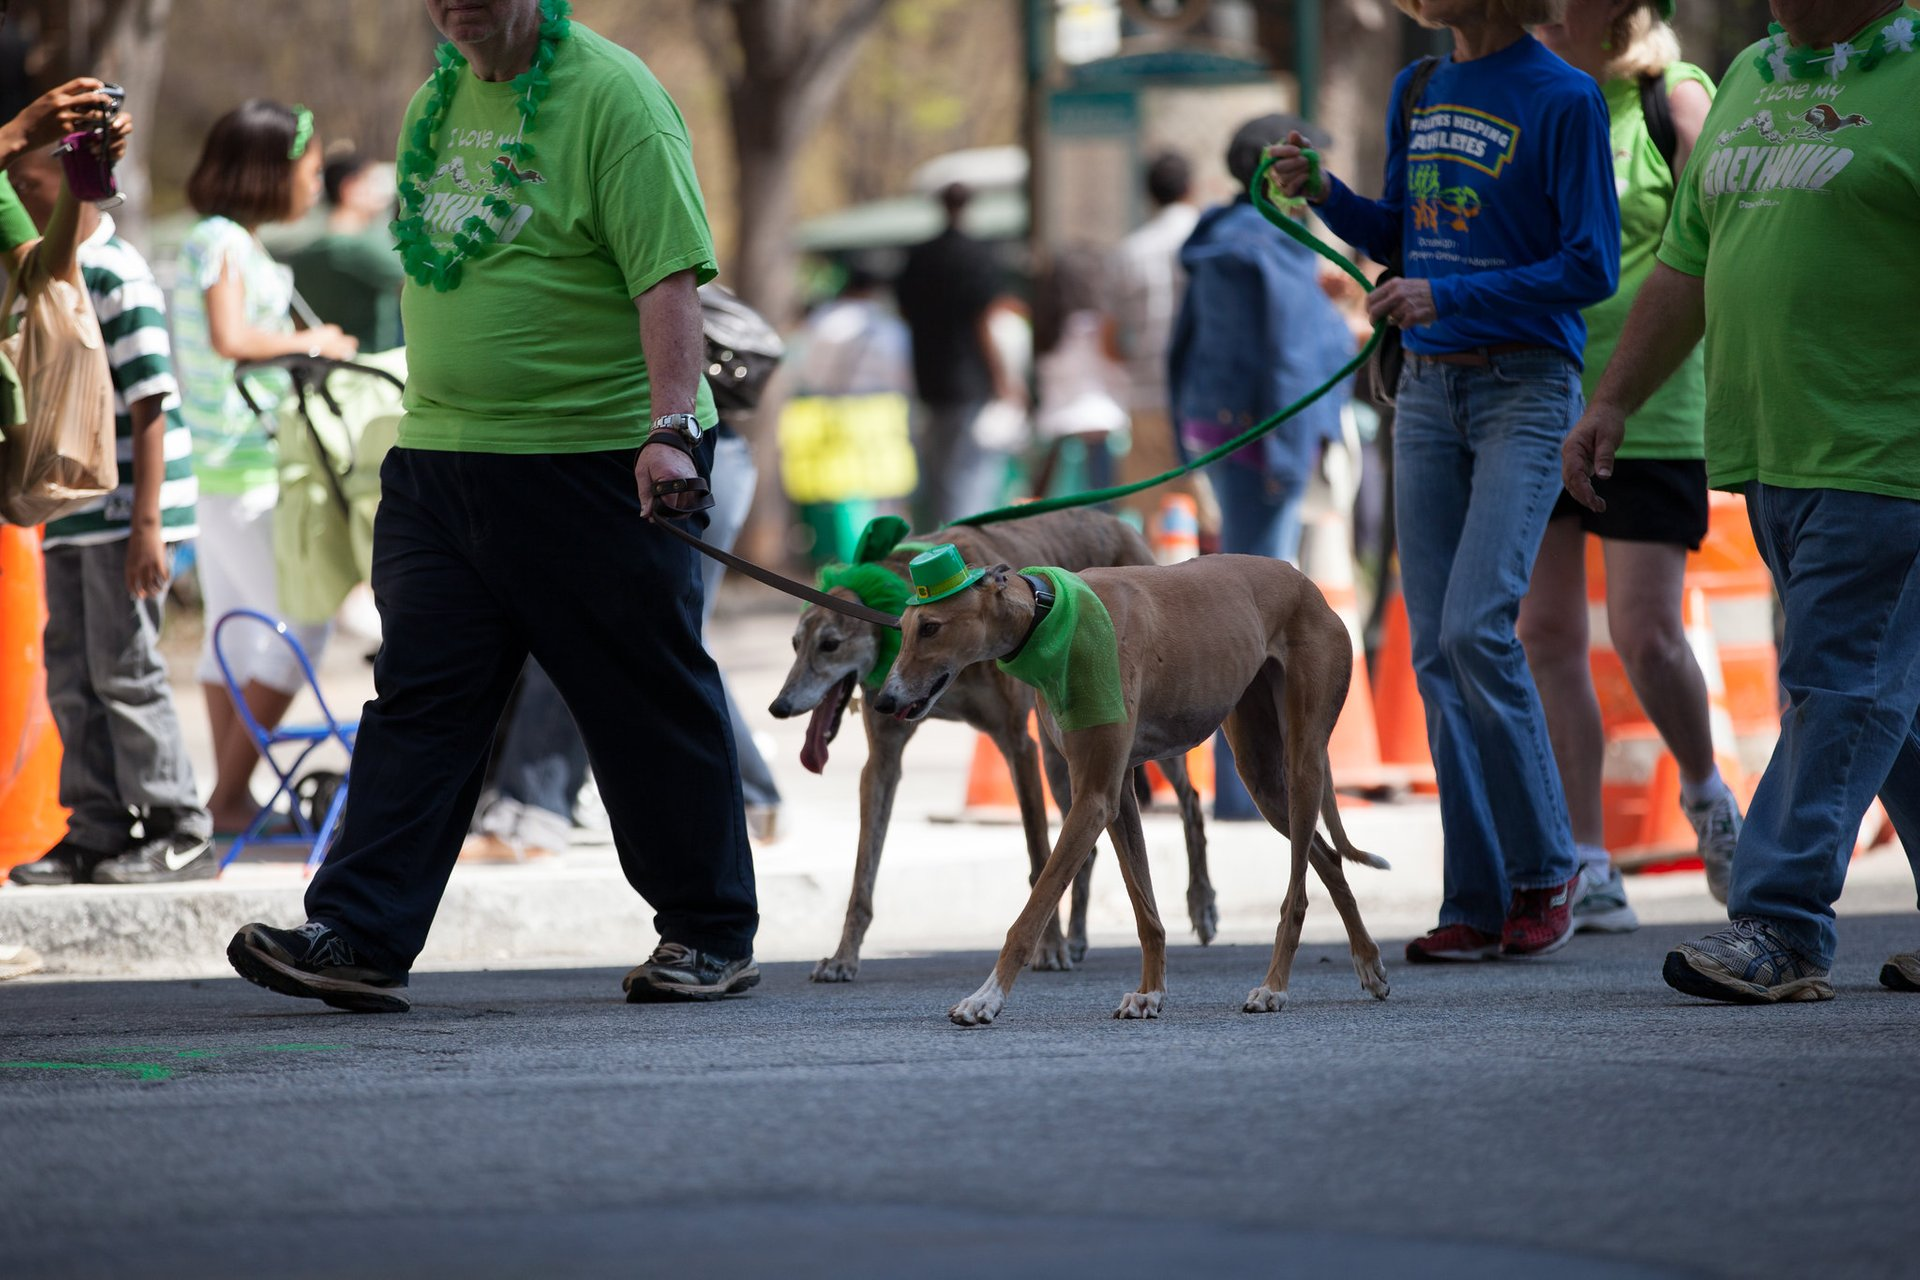 Atlanta St. Patrick's Parade in Atlanta - Best Season 2020